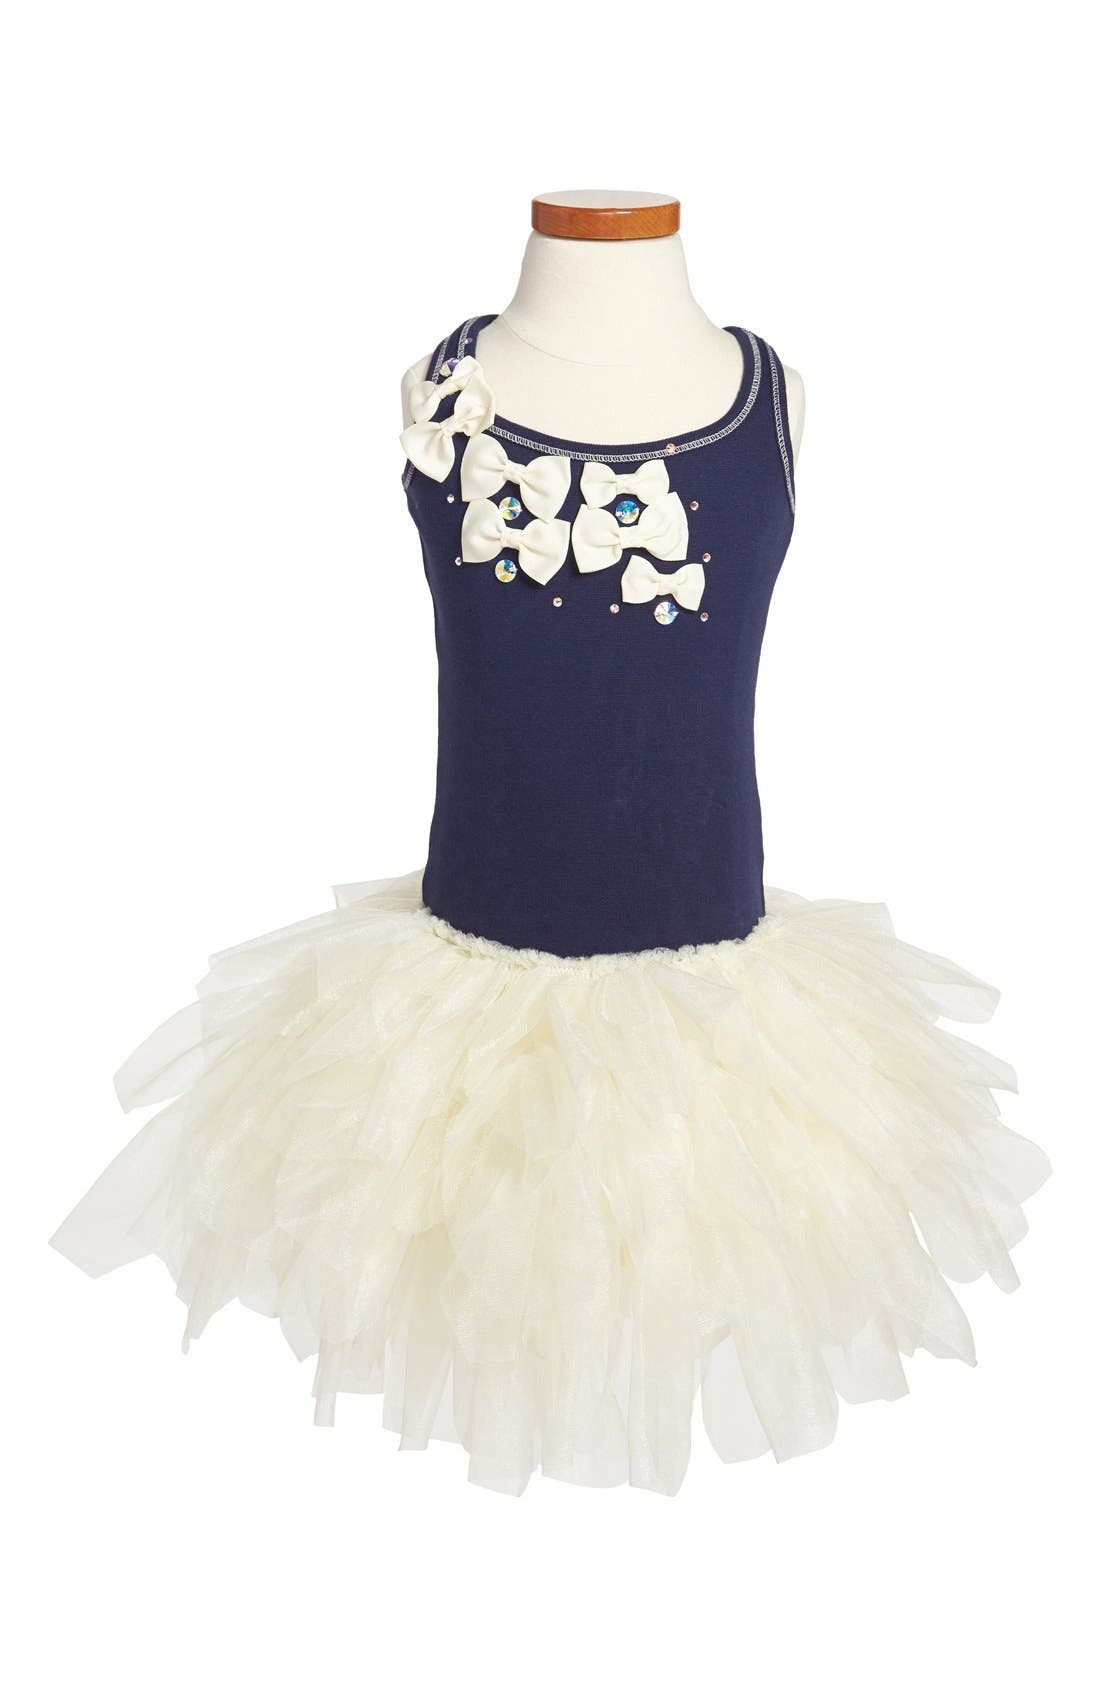 Alternate Image 1 Selected - Ooh! La, La! Couture 'Little Bow' Tulle Dress (Little Girls & Big Girls)